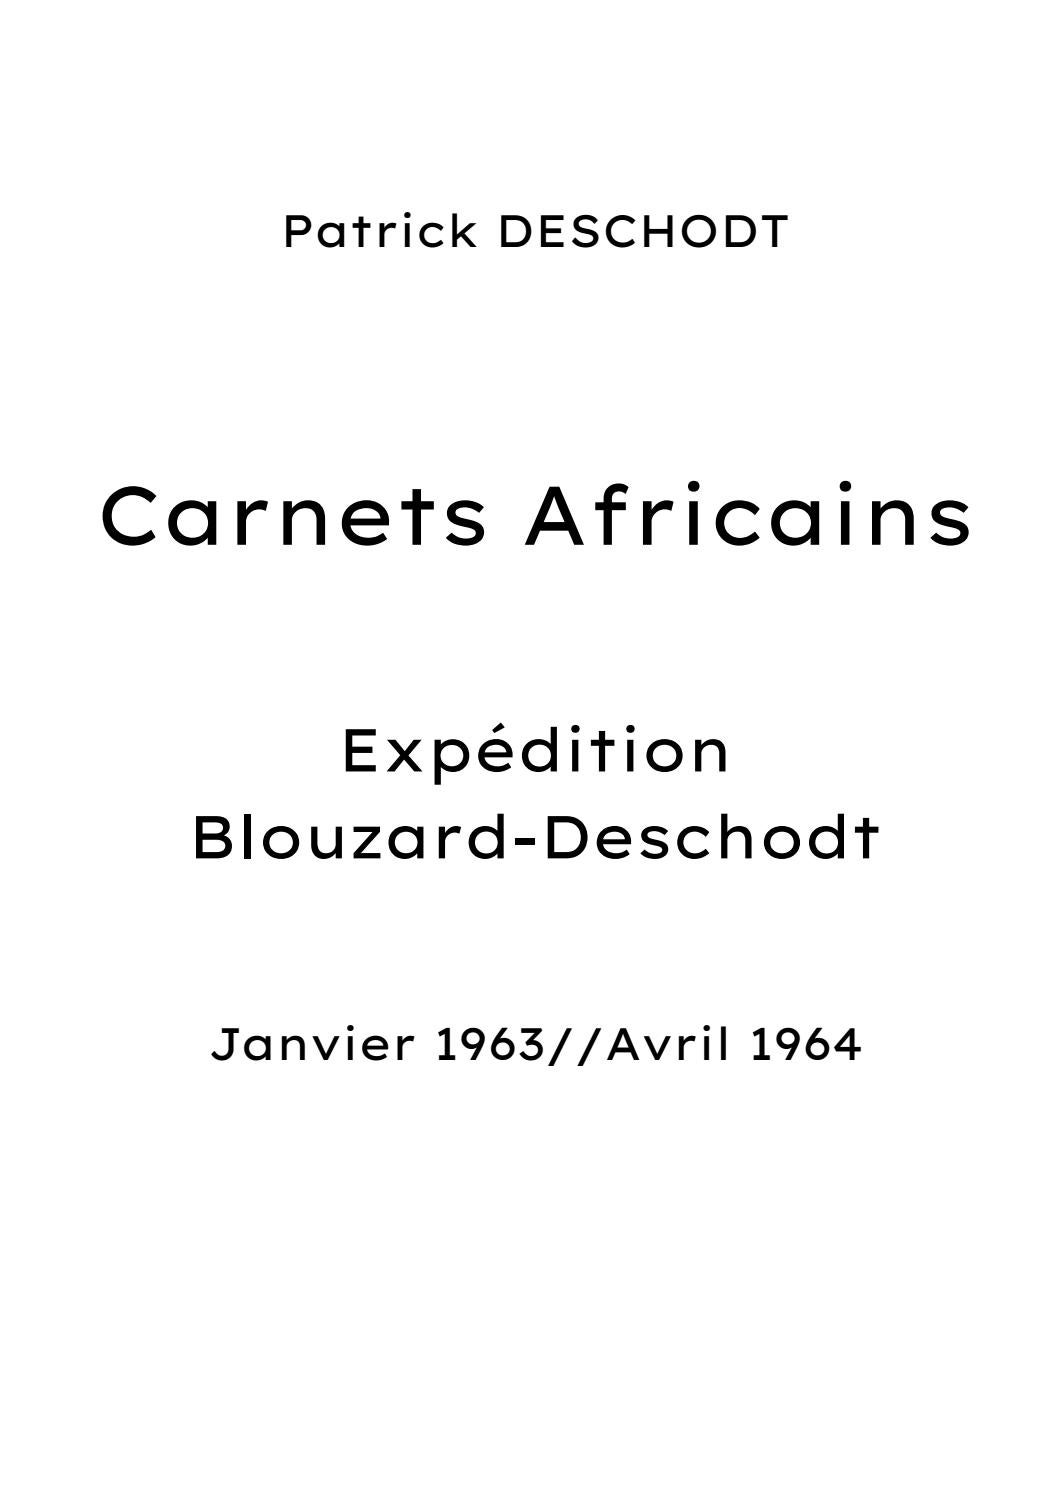 A Retenu Ulysse Bien Avant Belafonte : retenu, ulysse, avant, belafonte, Carnets, Africains, Patrick, DESCHODT, JEANNARD, Robert, Issuu